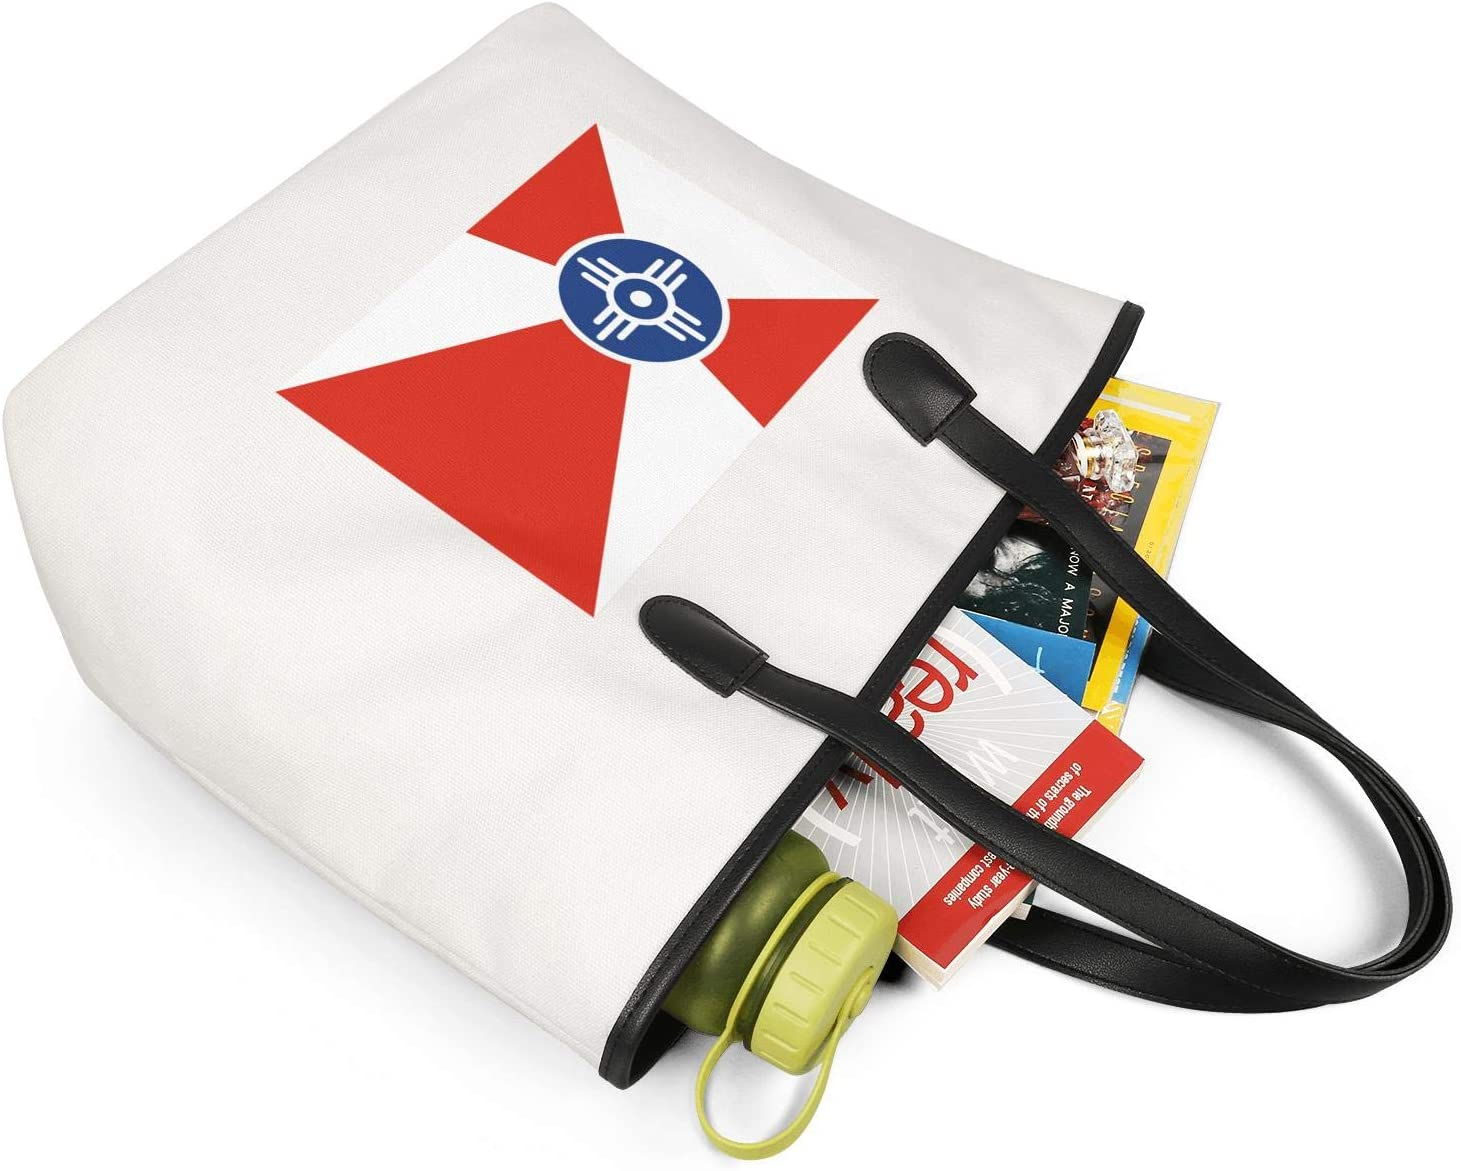 12.5X14 Inches Cute Zip Canvas Large Tote Bag Crazy Filipino American Flag Lady Beach Bag Handles Shoulder Bag Women Purse Grocery Bag Fashion Handbags Tote Bag Top Handle Satchel Purse